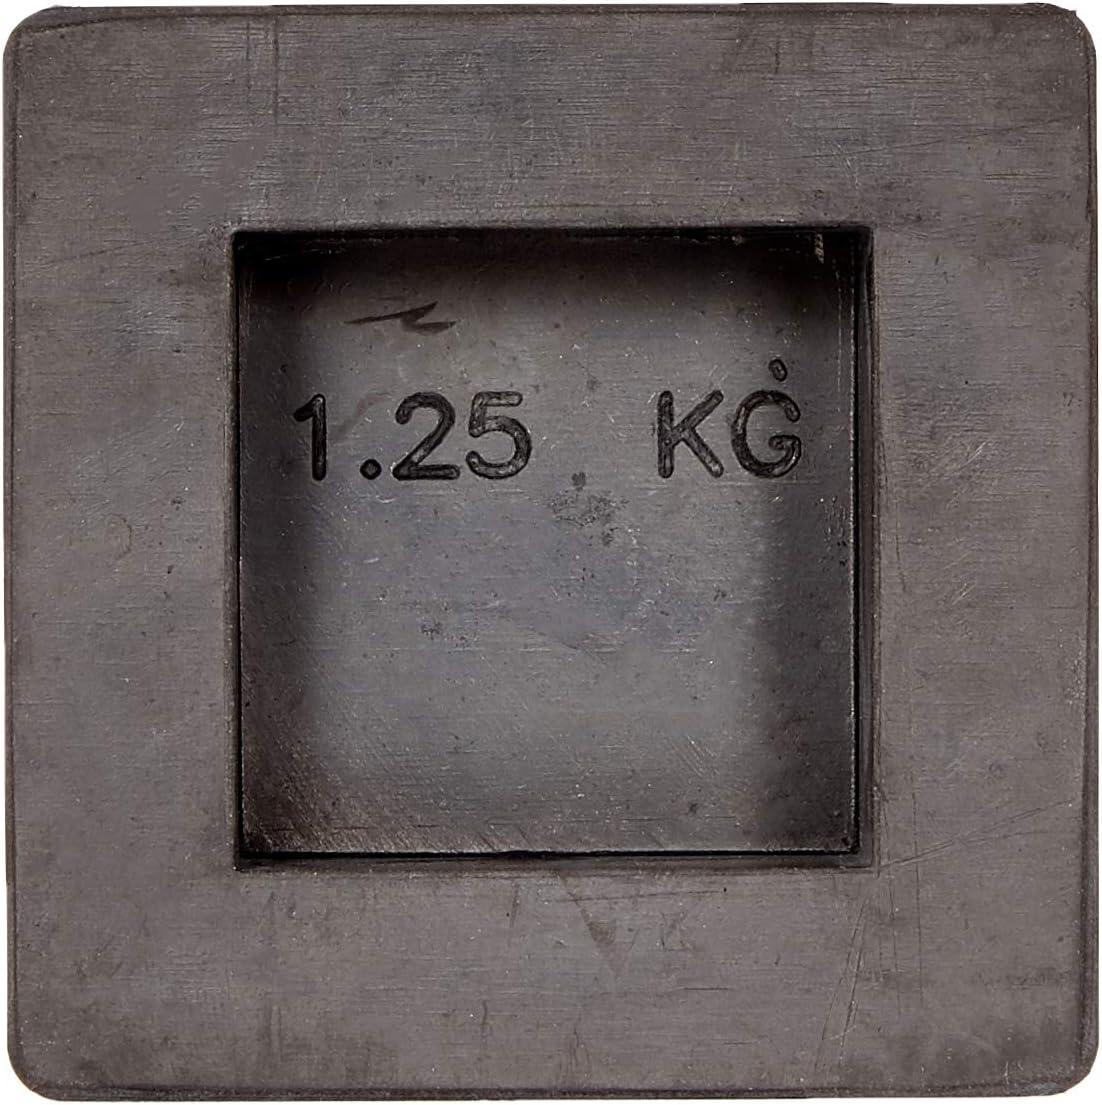 10 Flexible Kugelkopfschraube silber Metallmaterialien 14 1 cm Befestigungsmutter Sortiment Metall f/ür 1//10 94122 94166 94155 94188 RC Auto